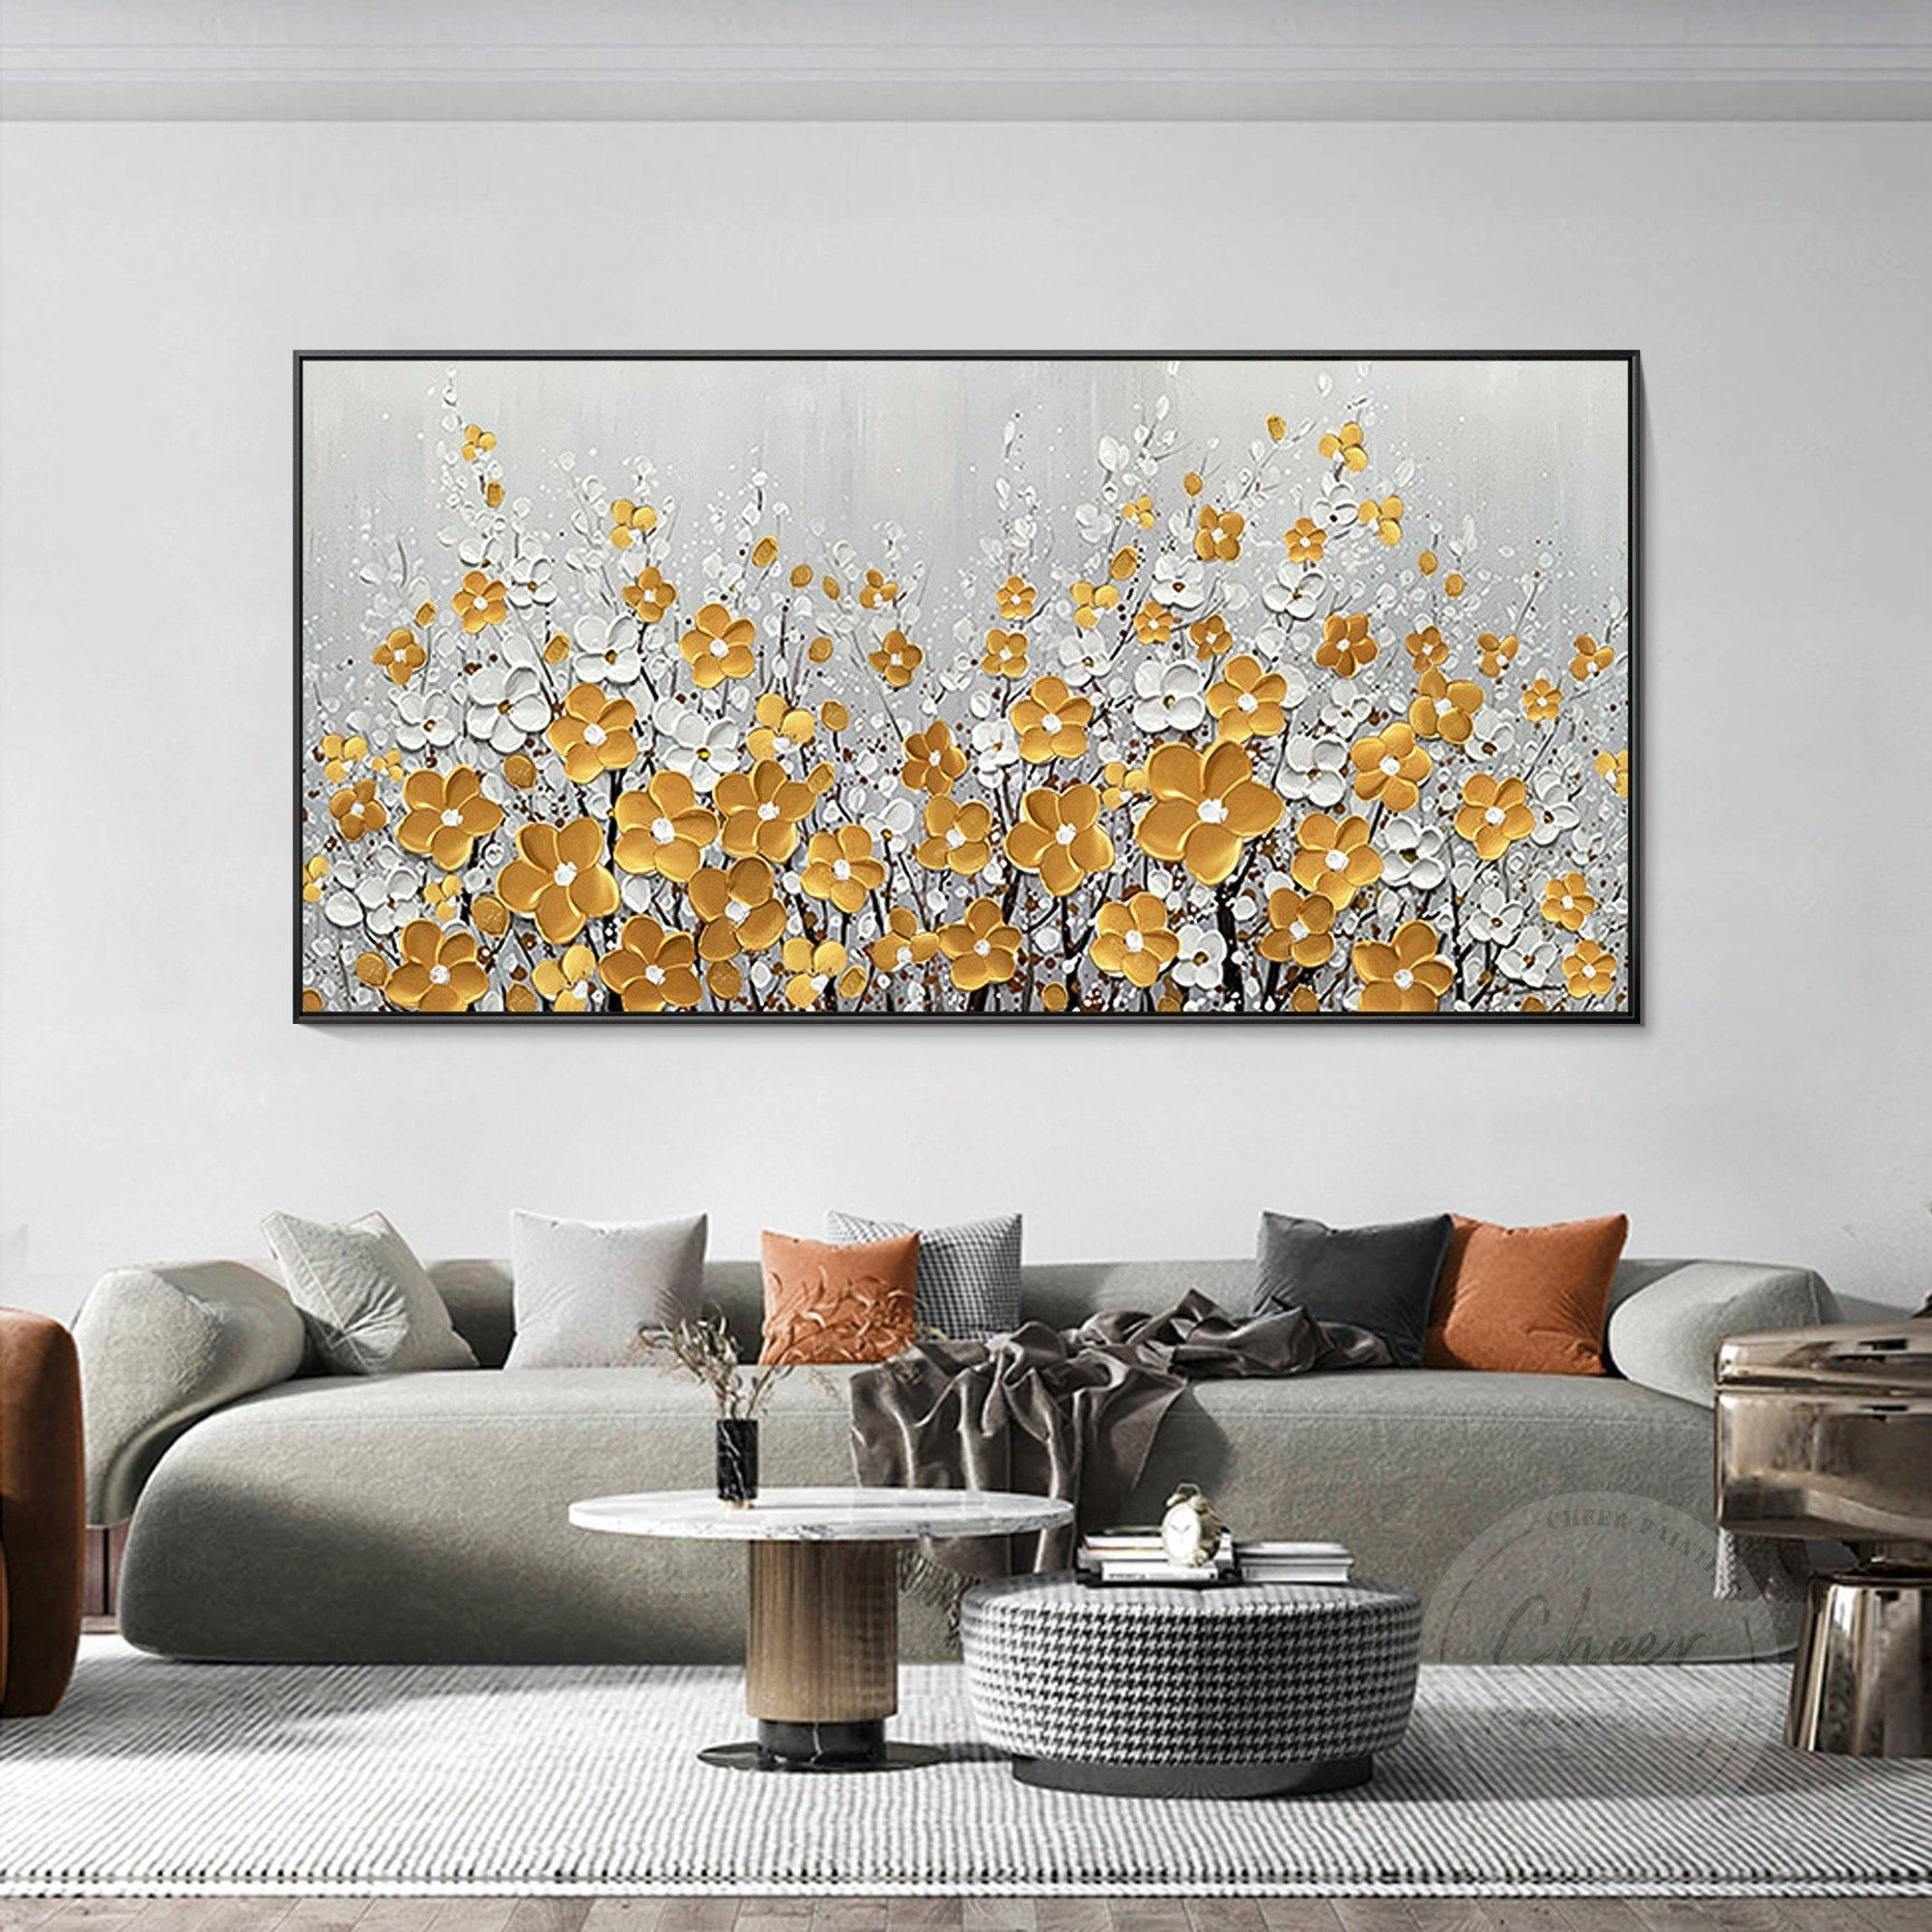 Flower Painting Bathroom Large Original Oil Painting Heavy Etsy In 2021 Large Paintings Living Room Painting Flower Painting Canvas